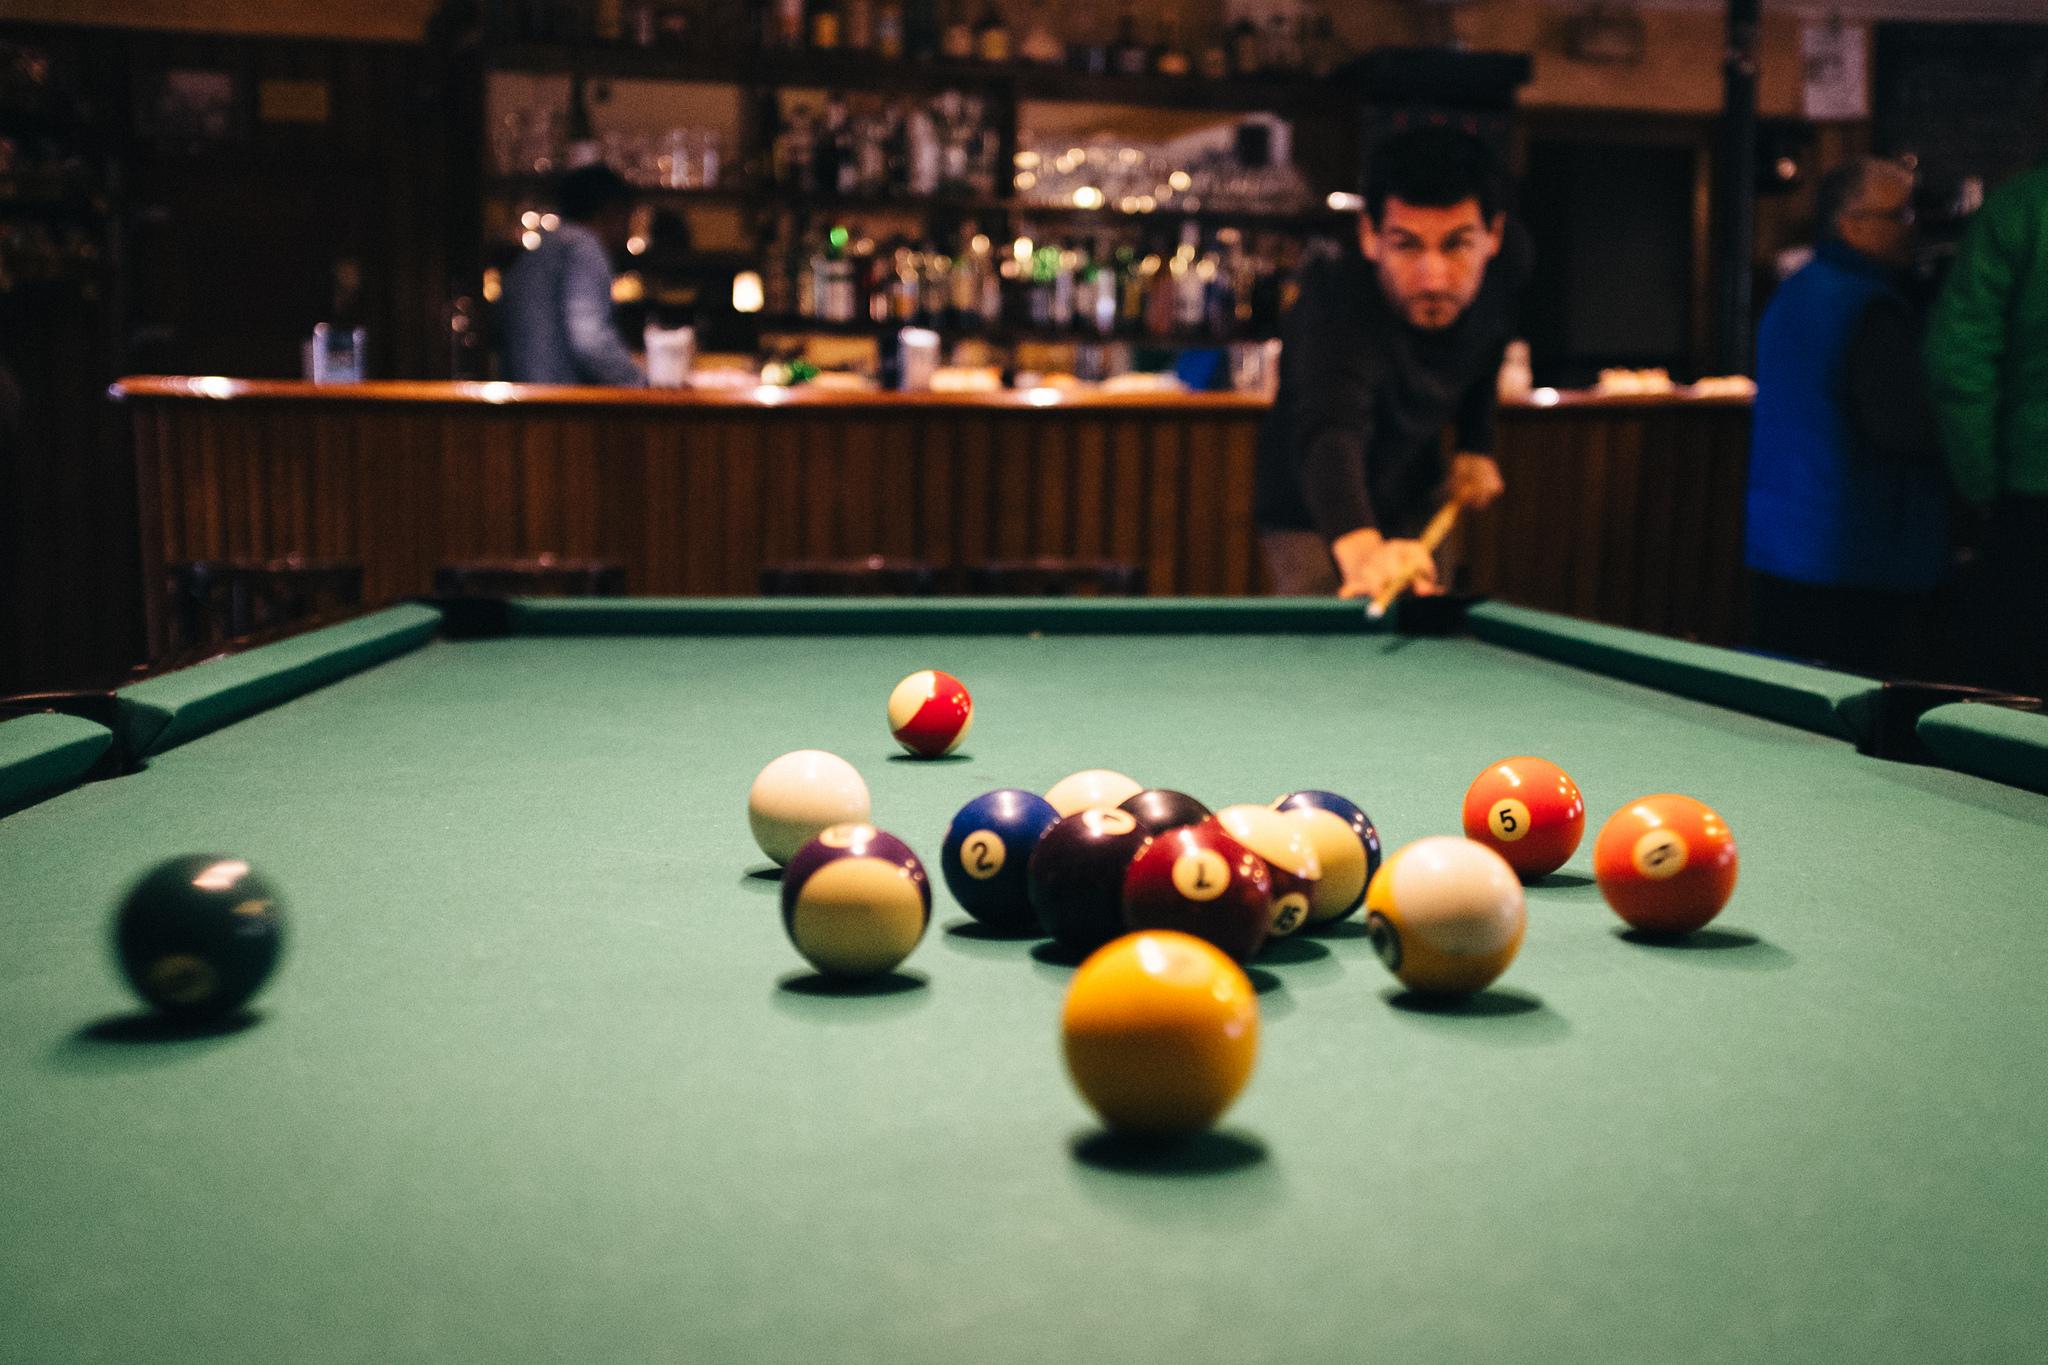 Billiard © Guillermo Alonso/flickr